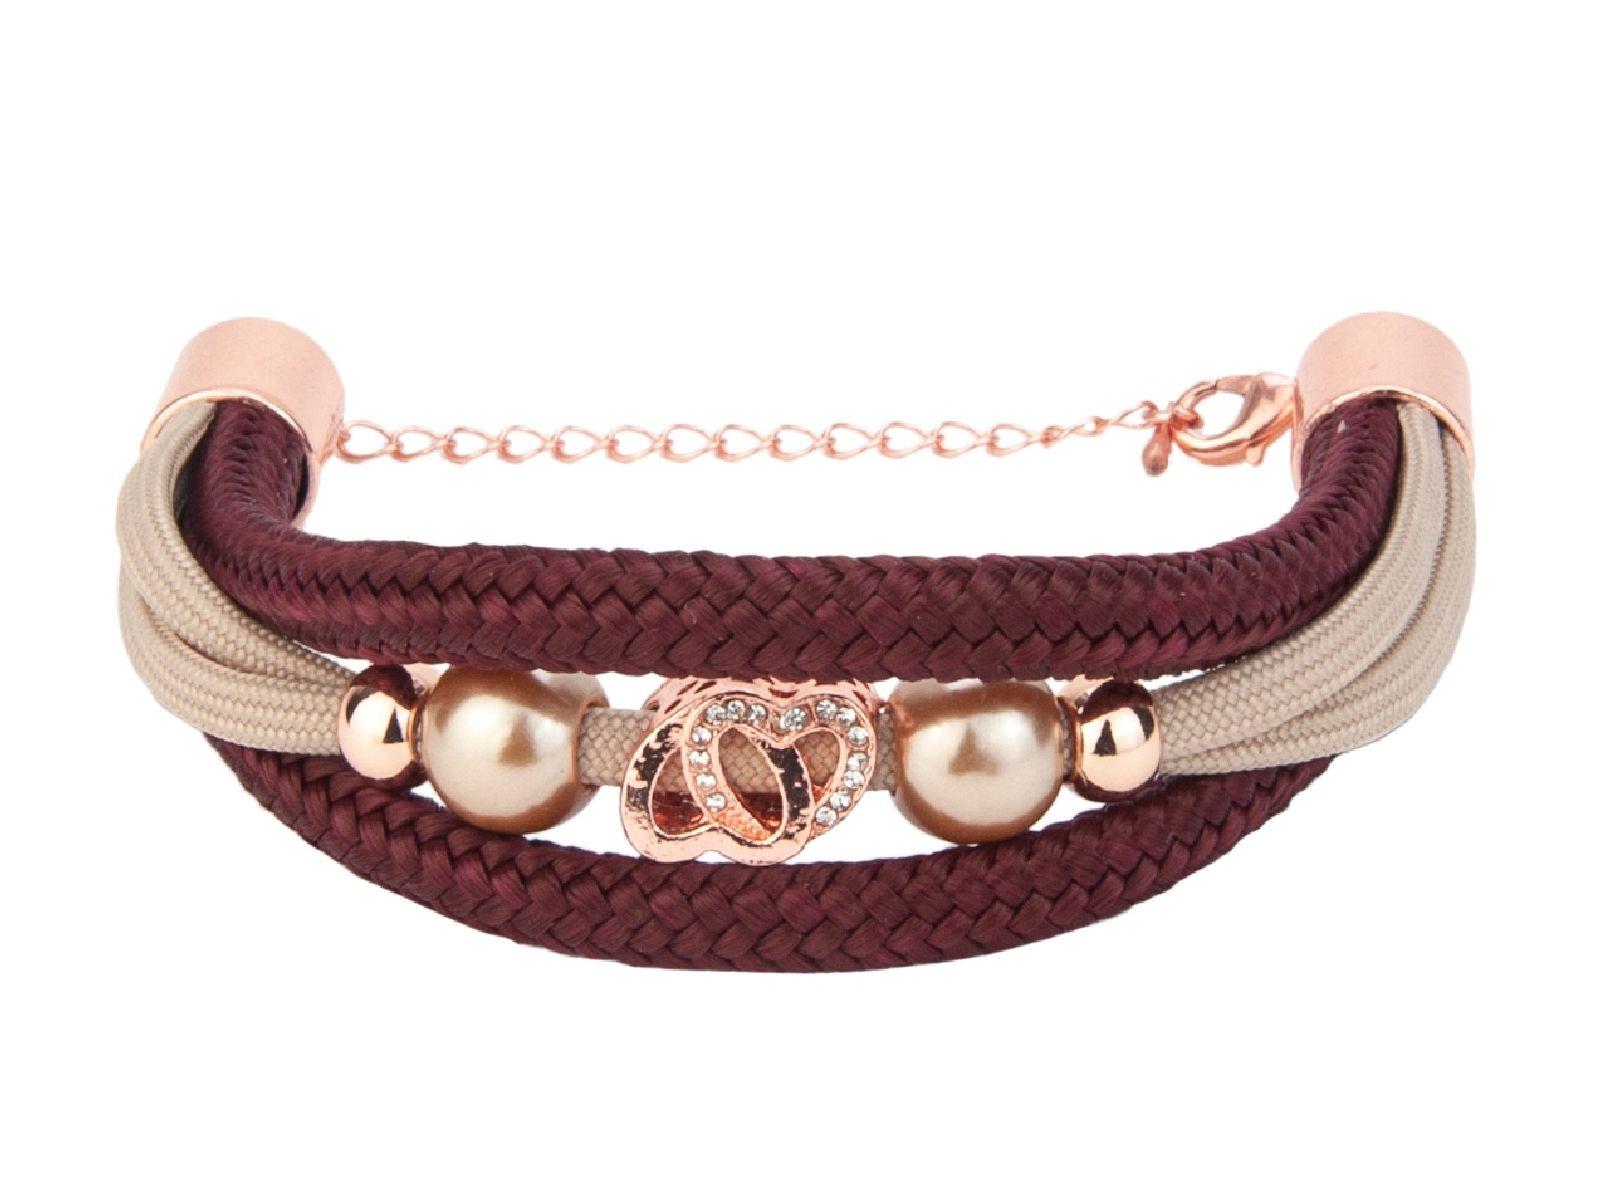 Armband Marie Antoinette